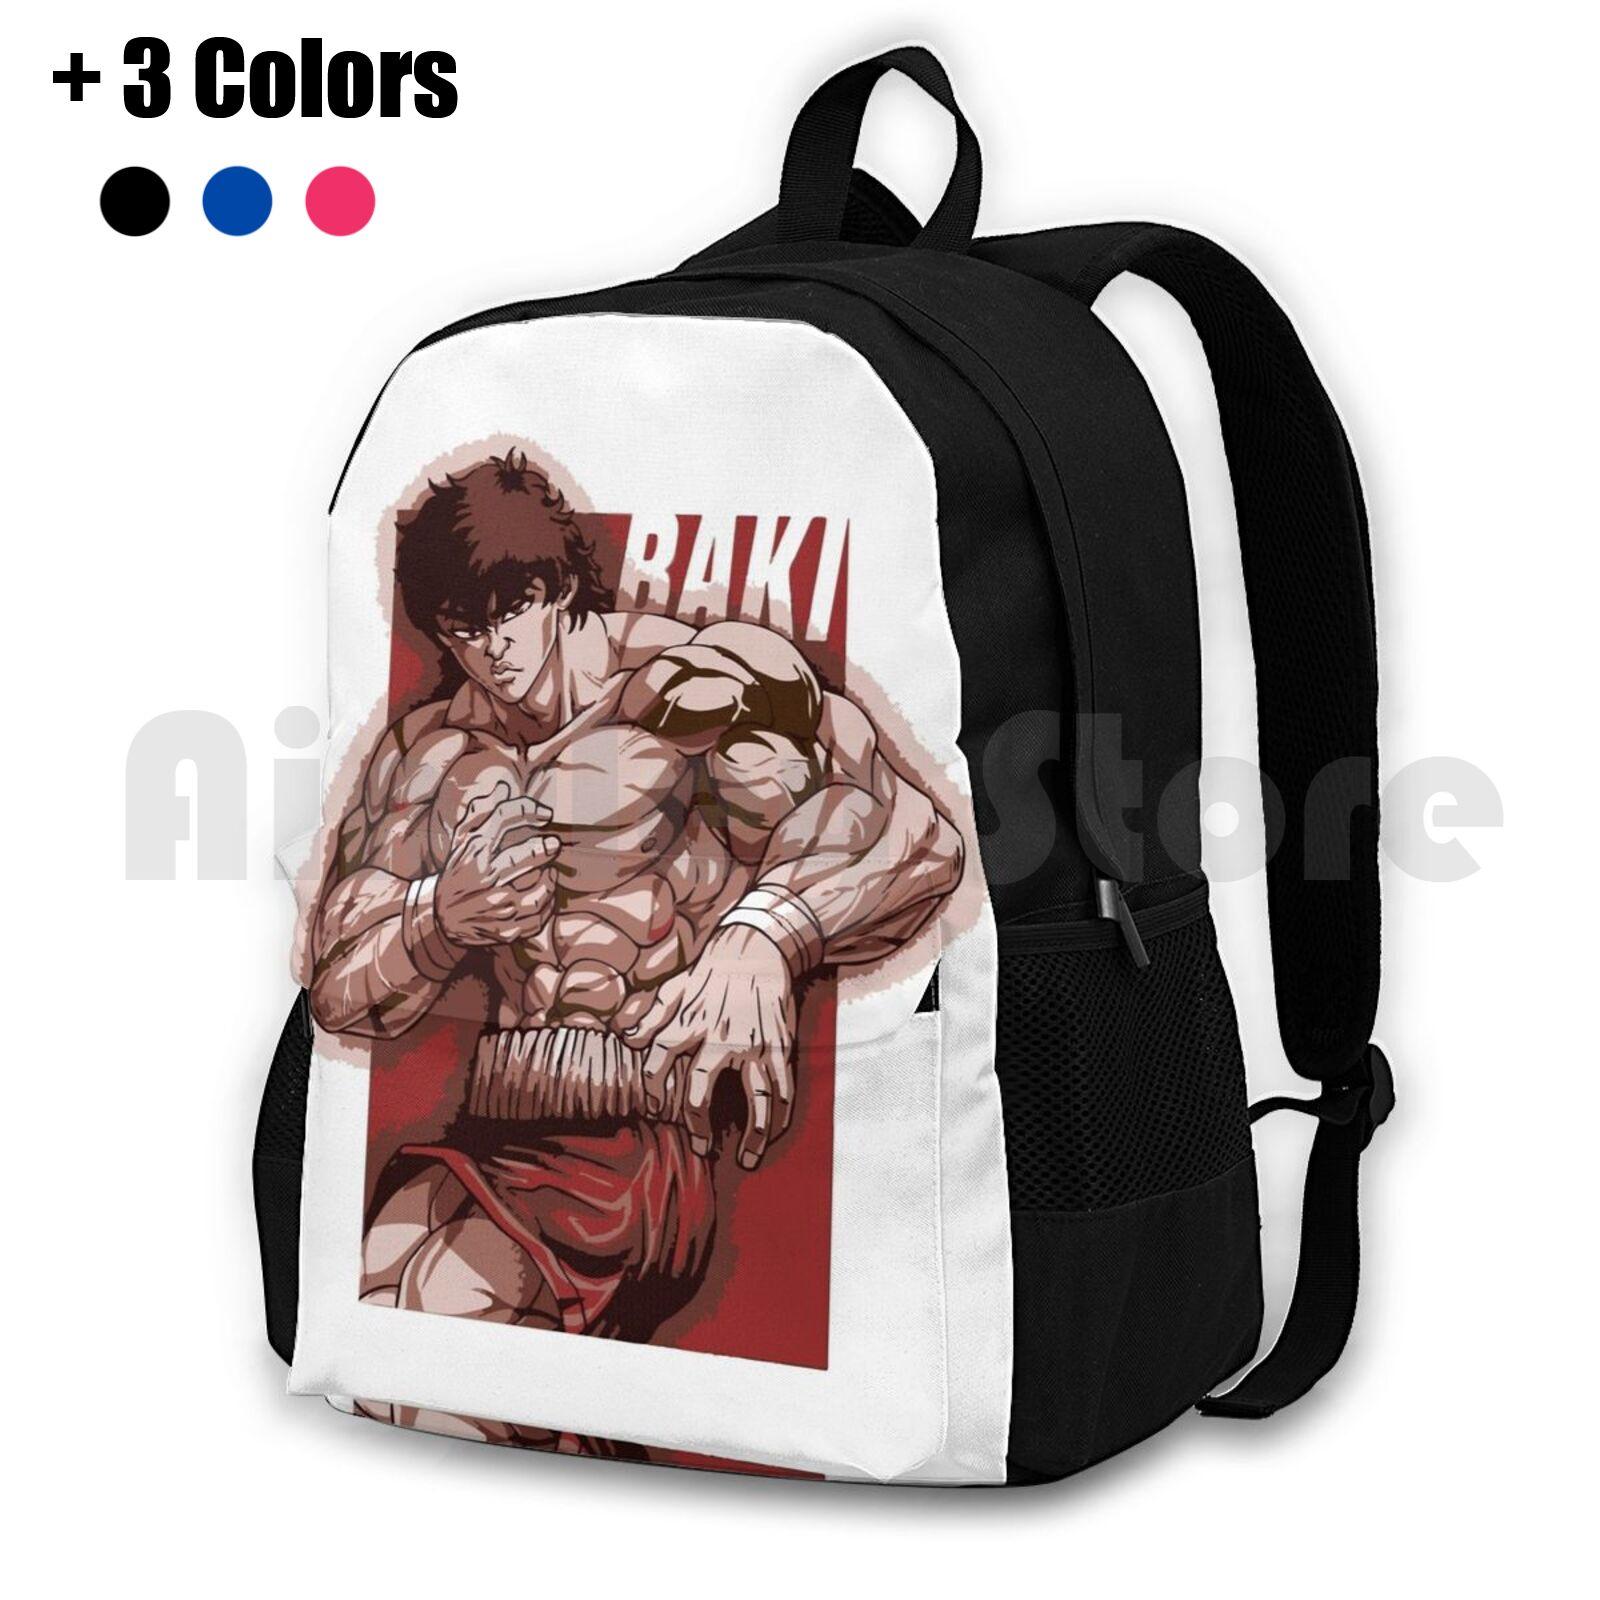 H668daba9afff4307addc865b3bbe162bT - Anime Backpacks